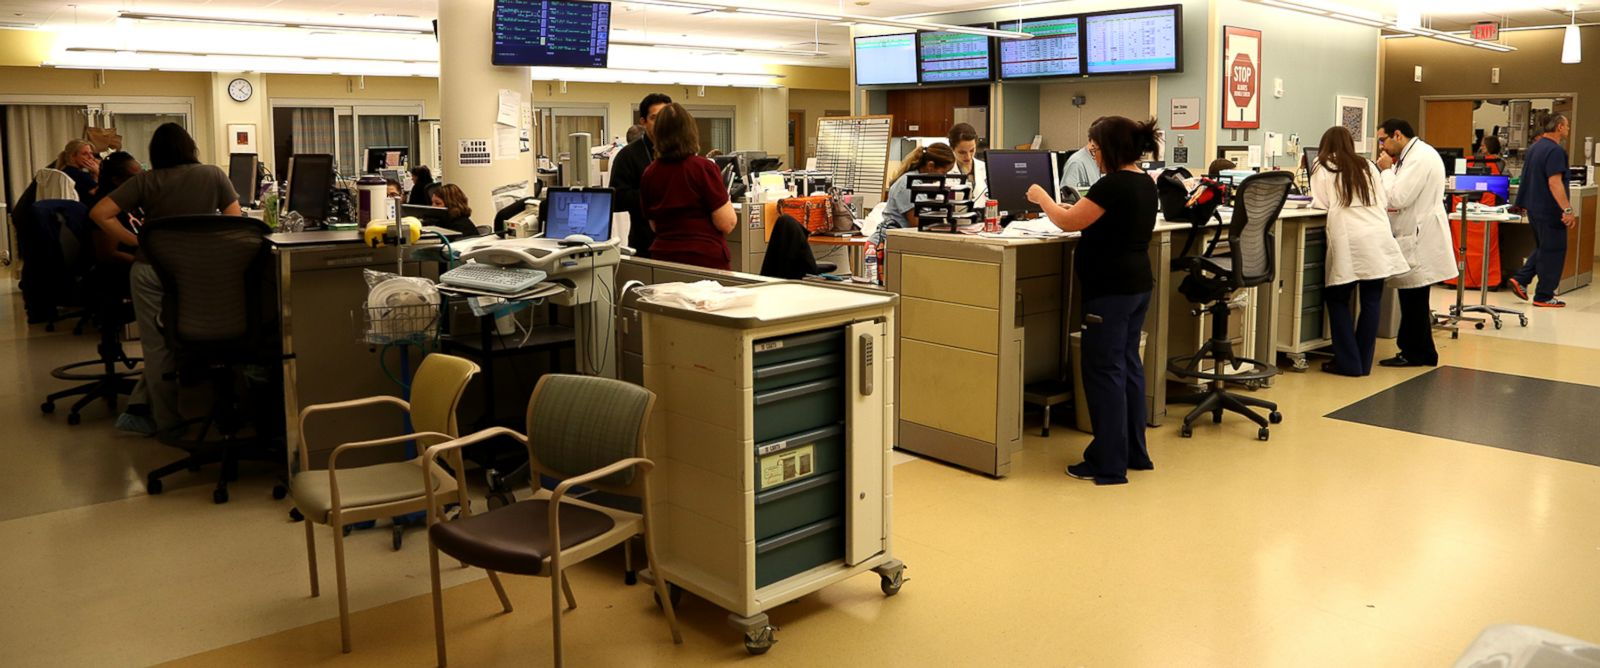 University: University Hospitals Case Medical Center